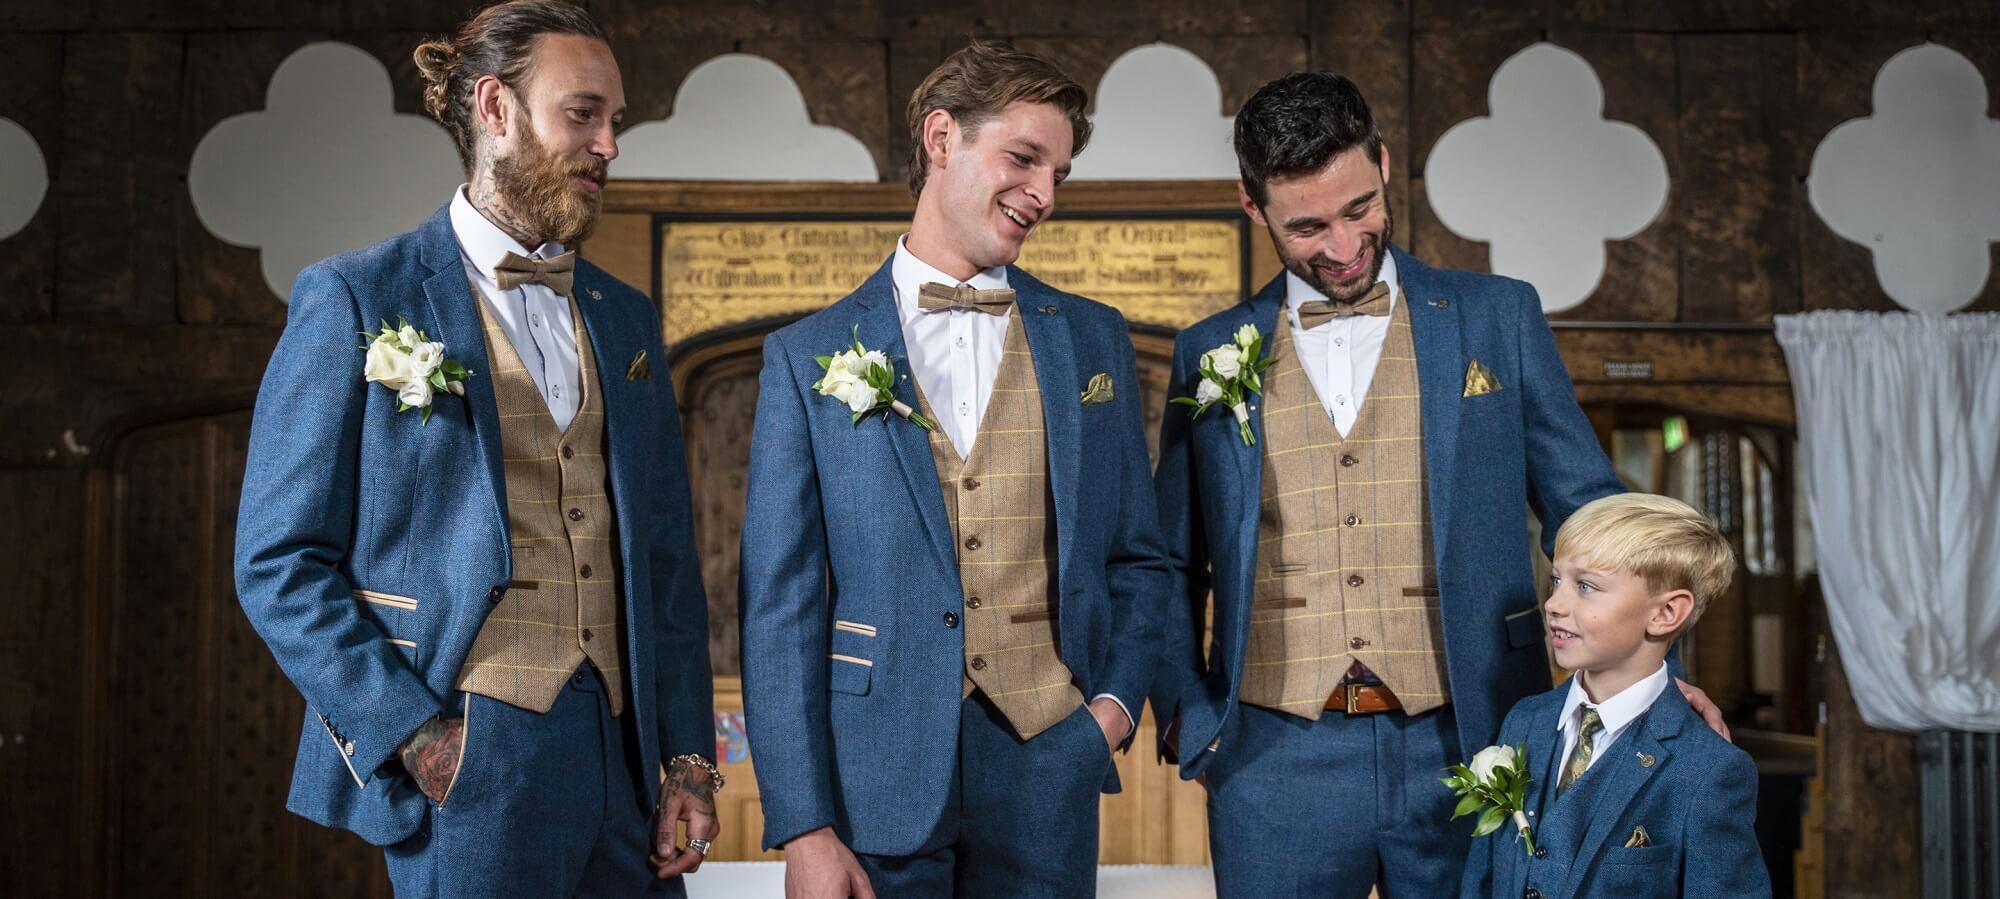 Joshua Adams weddings